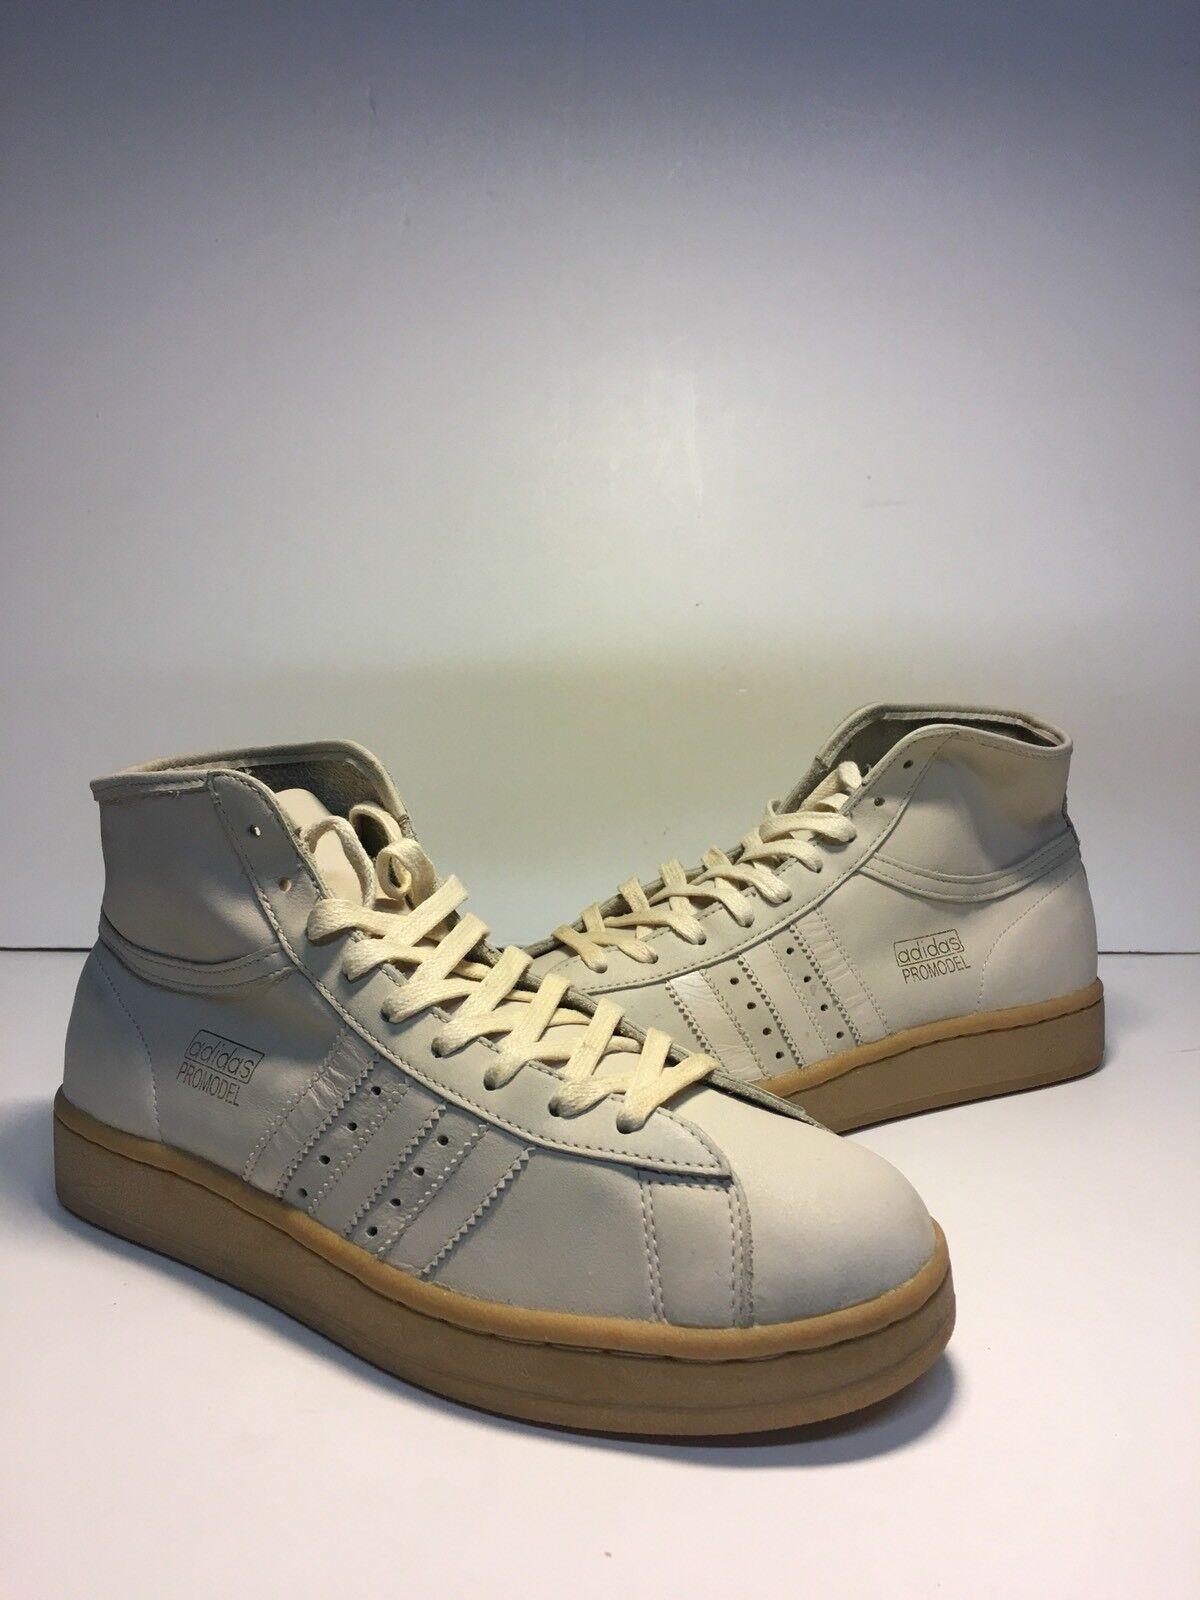 Adidas Pro Model Mens Size 7.5 Nubuck Vintage 2004